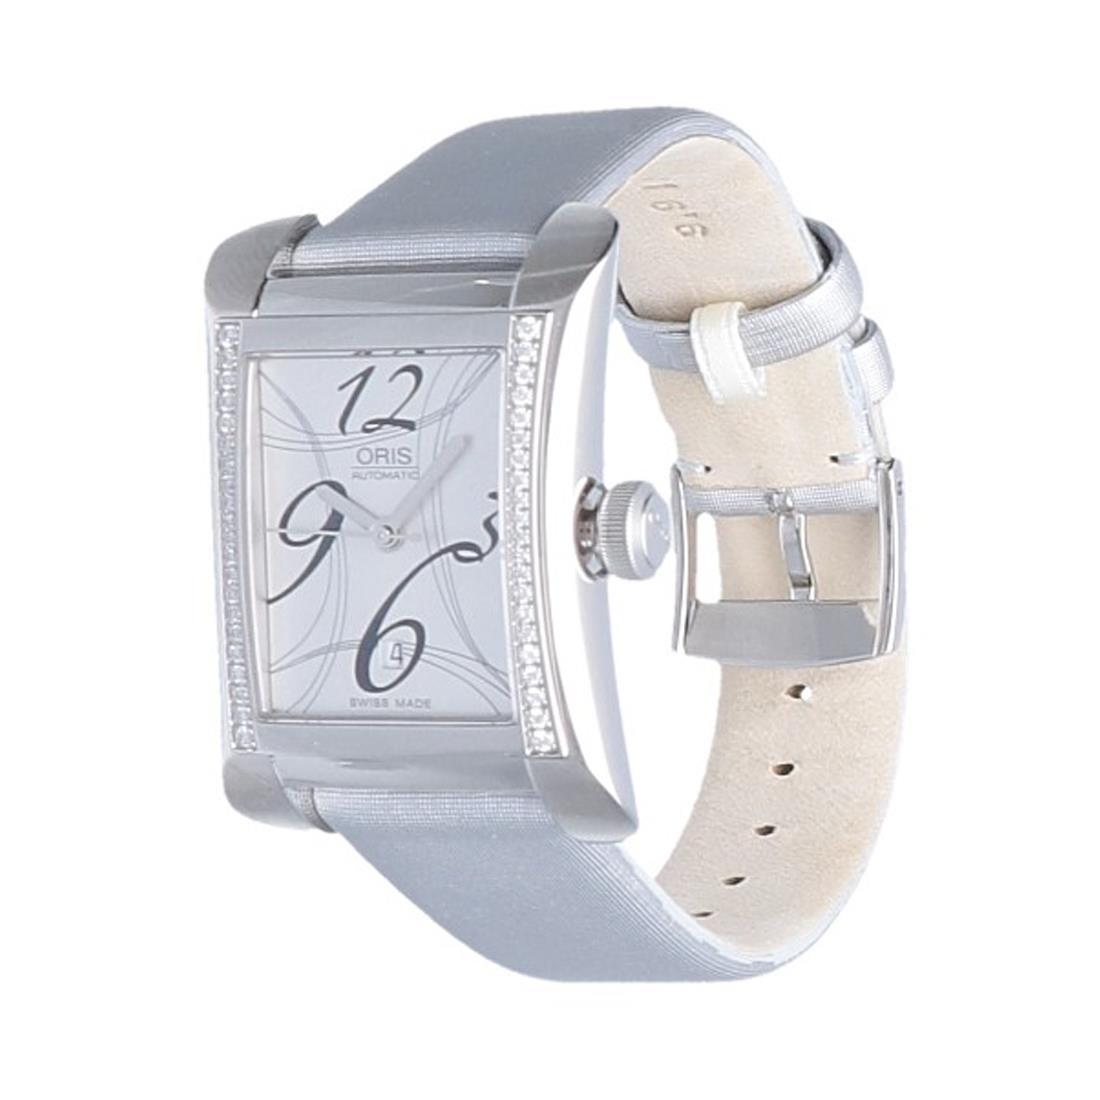 Orologio cassa  25,90 x 37,00 mm in acciaio inossidabile e diamanti - ORIS